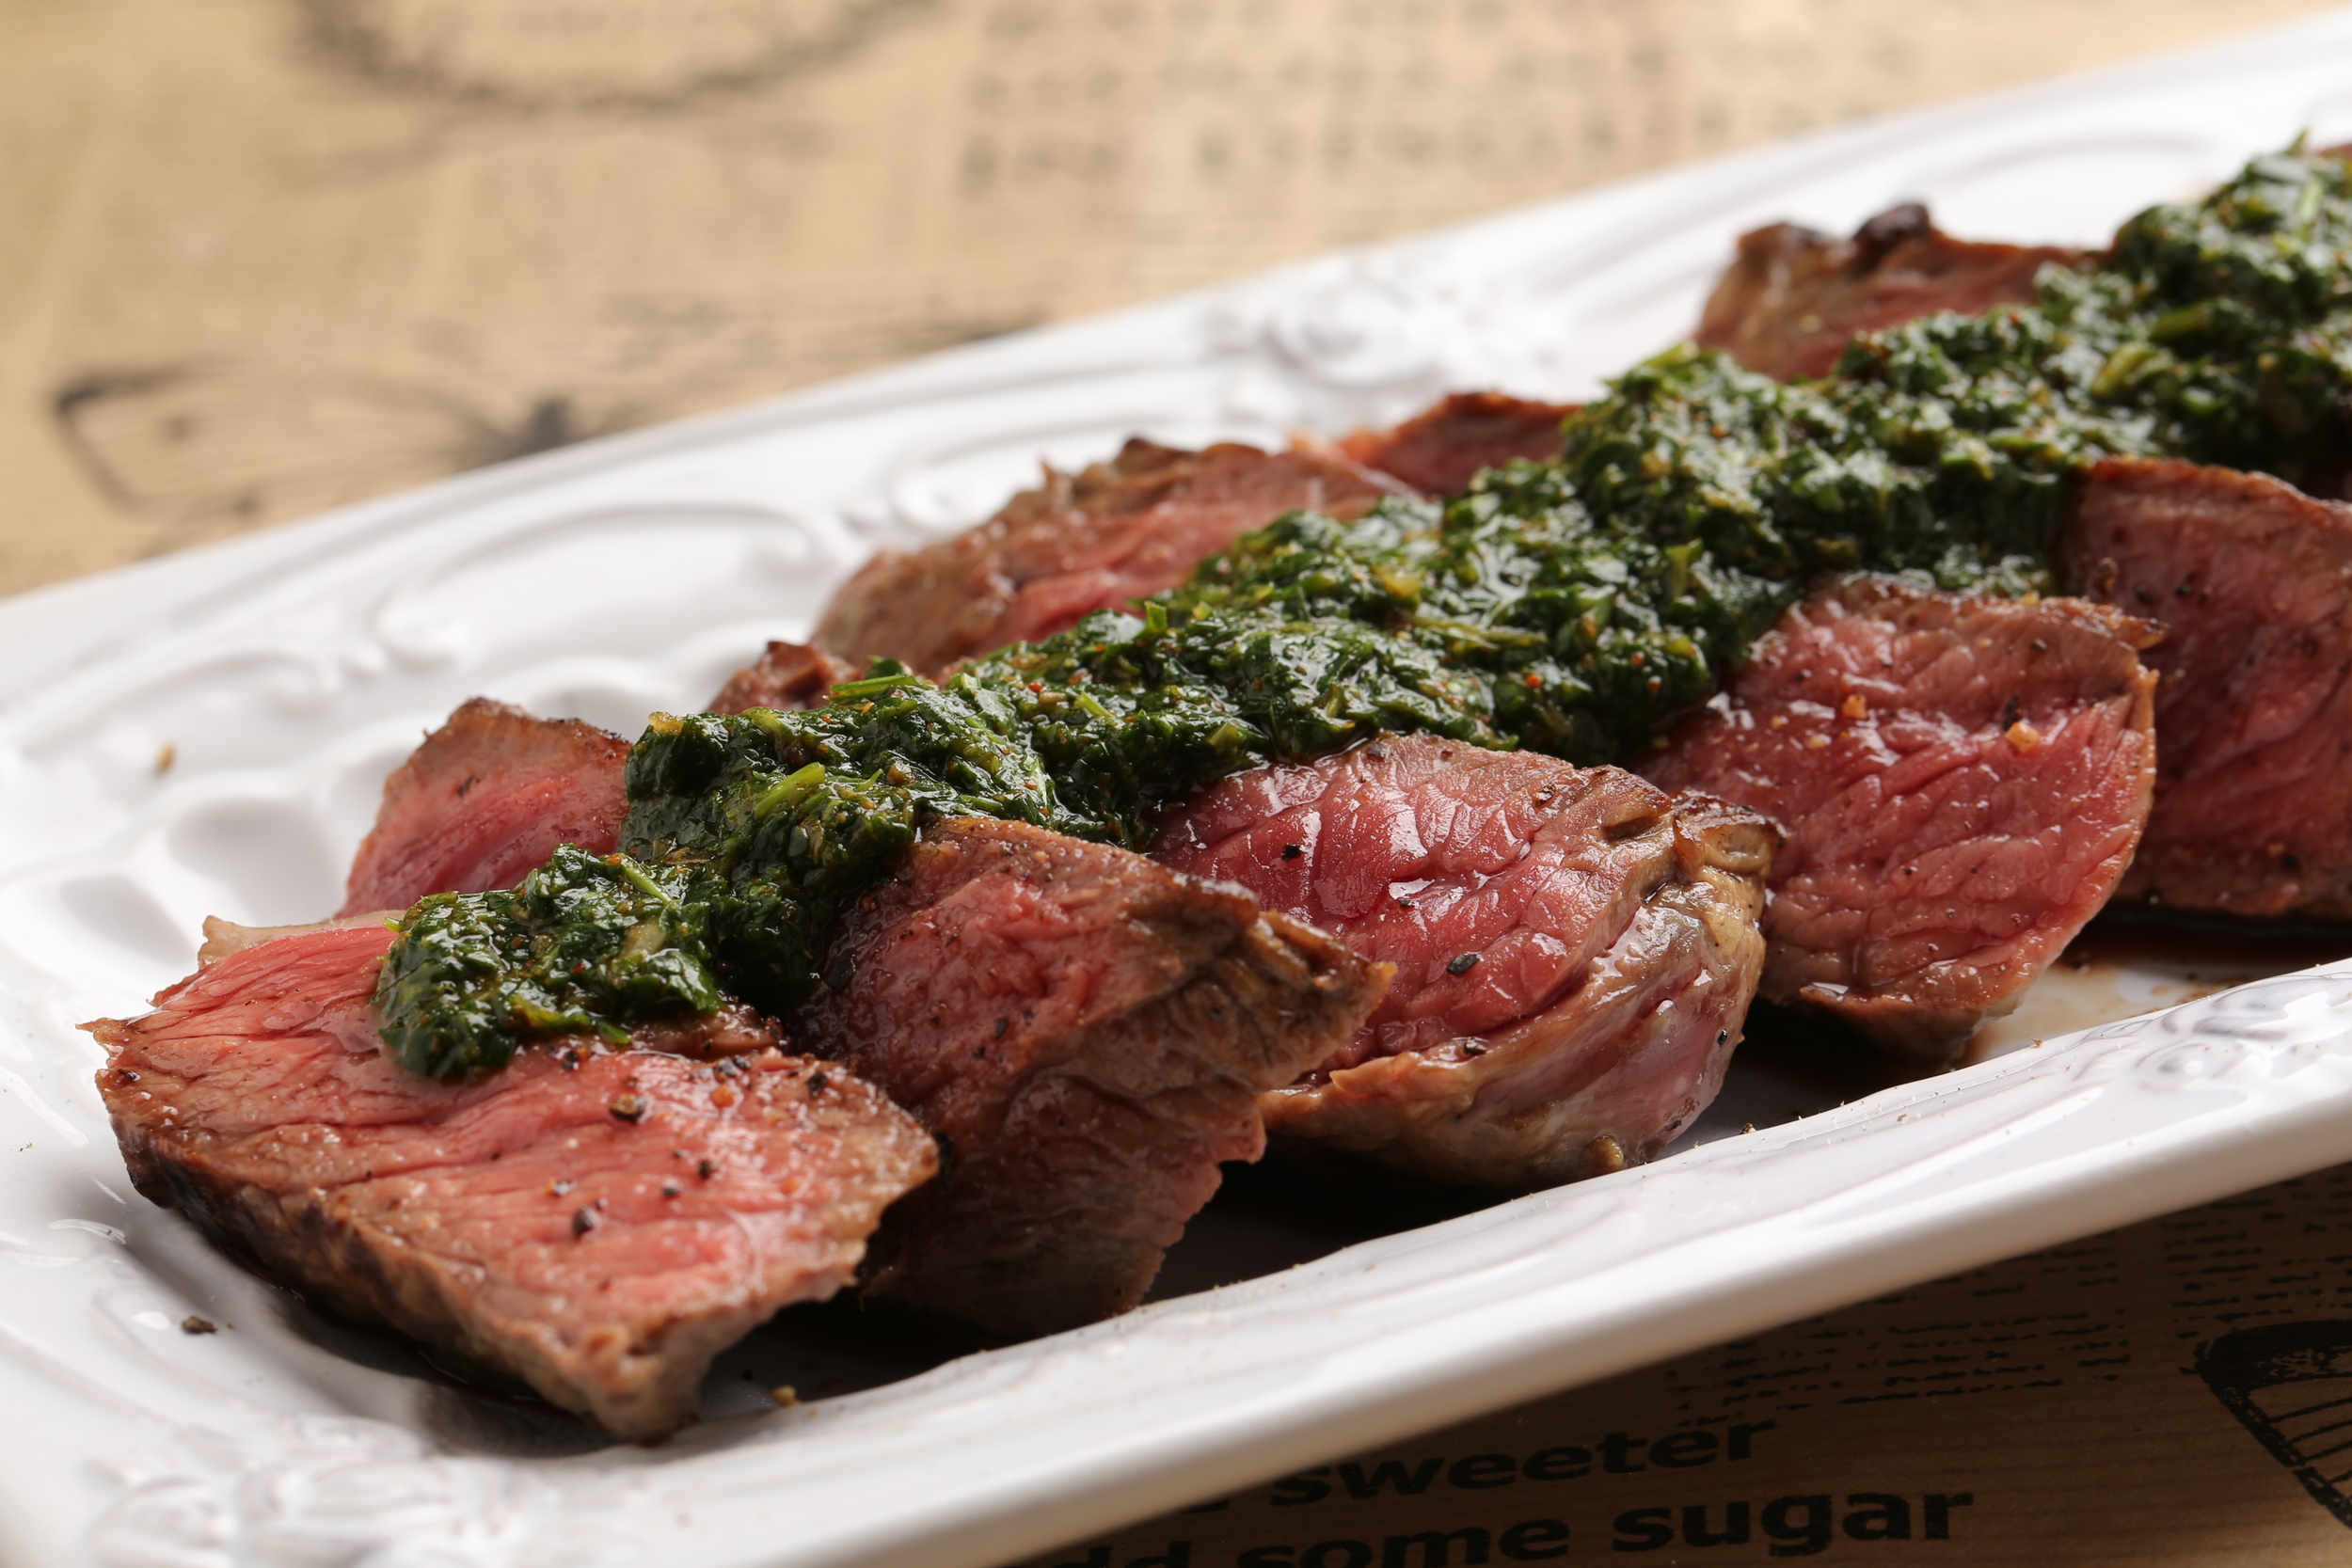 Steak and Chimichurri